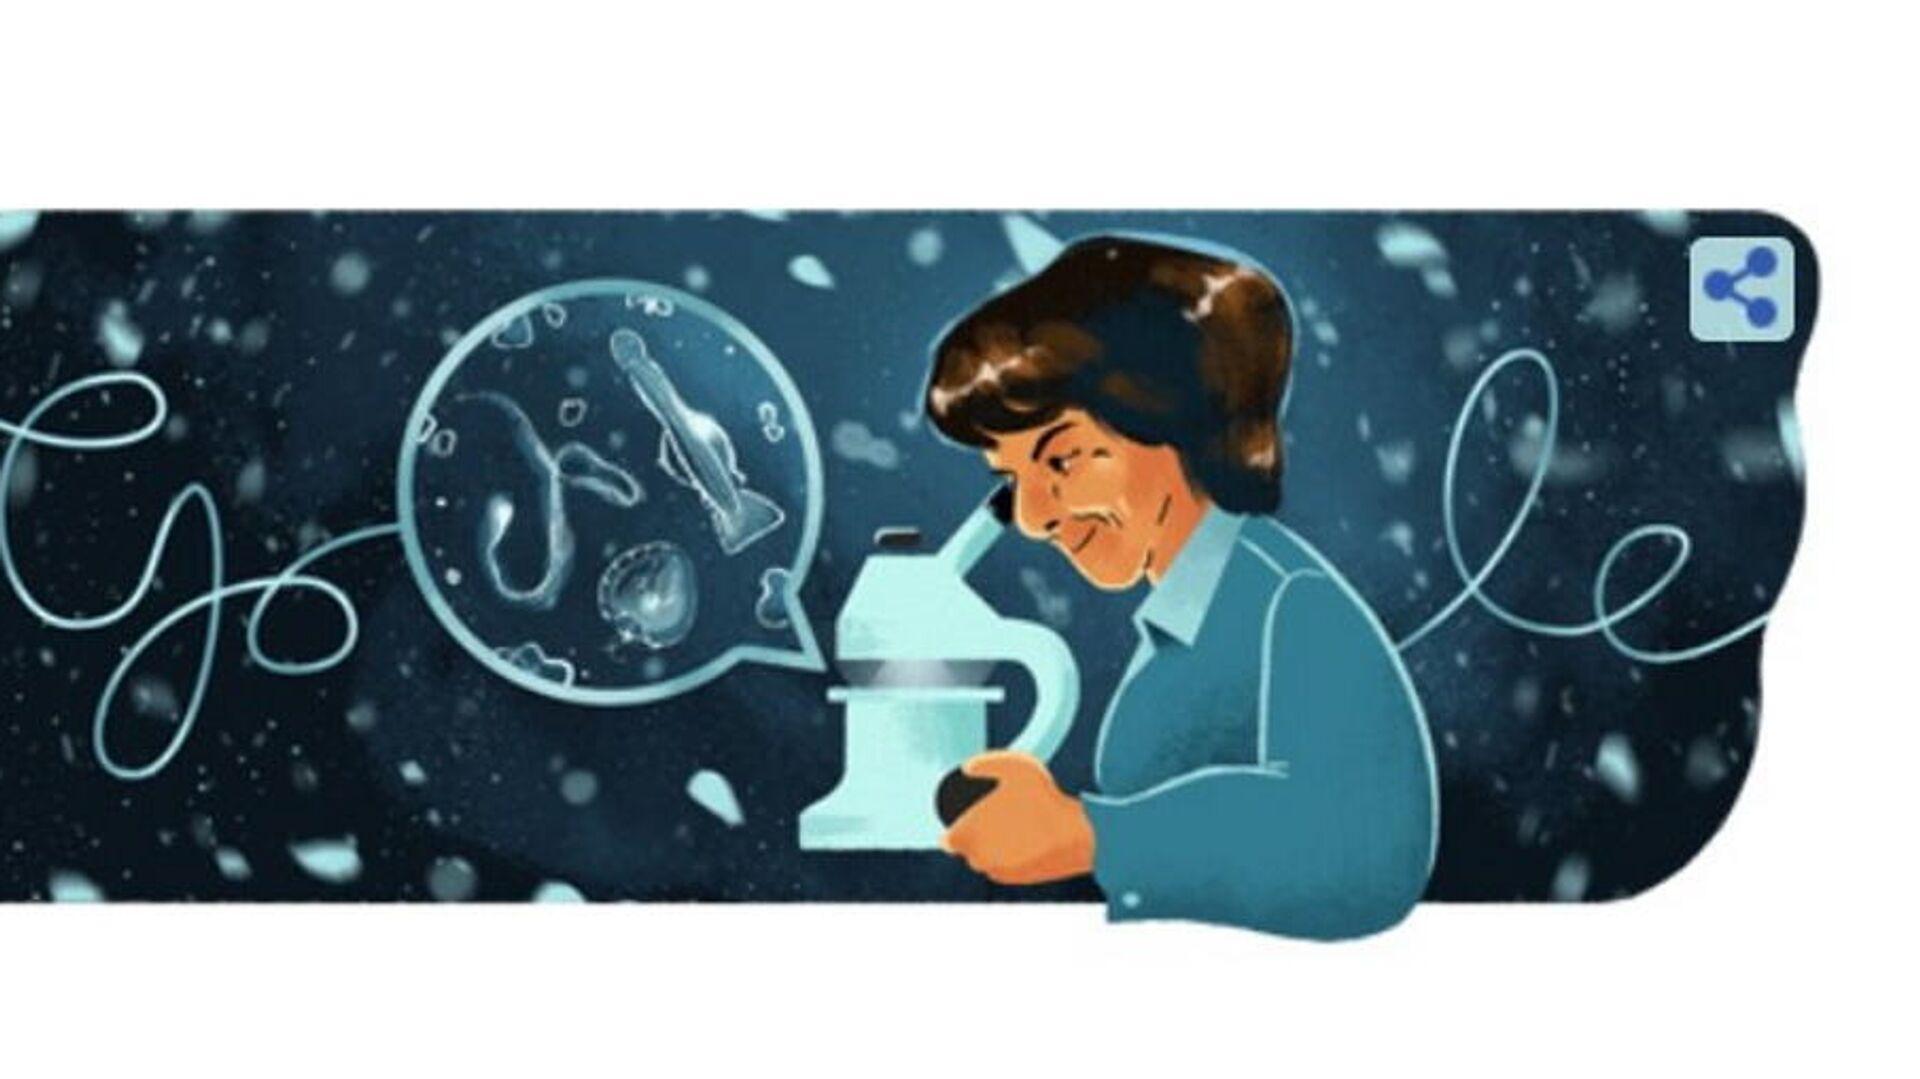 Google Doodle για τη María de los Ángeles Alvariño González, 2 Οκτωβρίου 2021 - Sputnik Ελλάδα, 1920, 03.10.2021